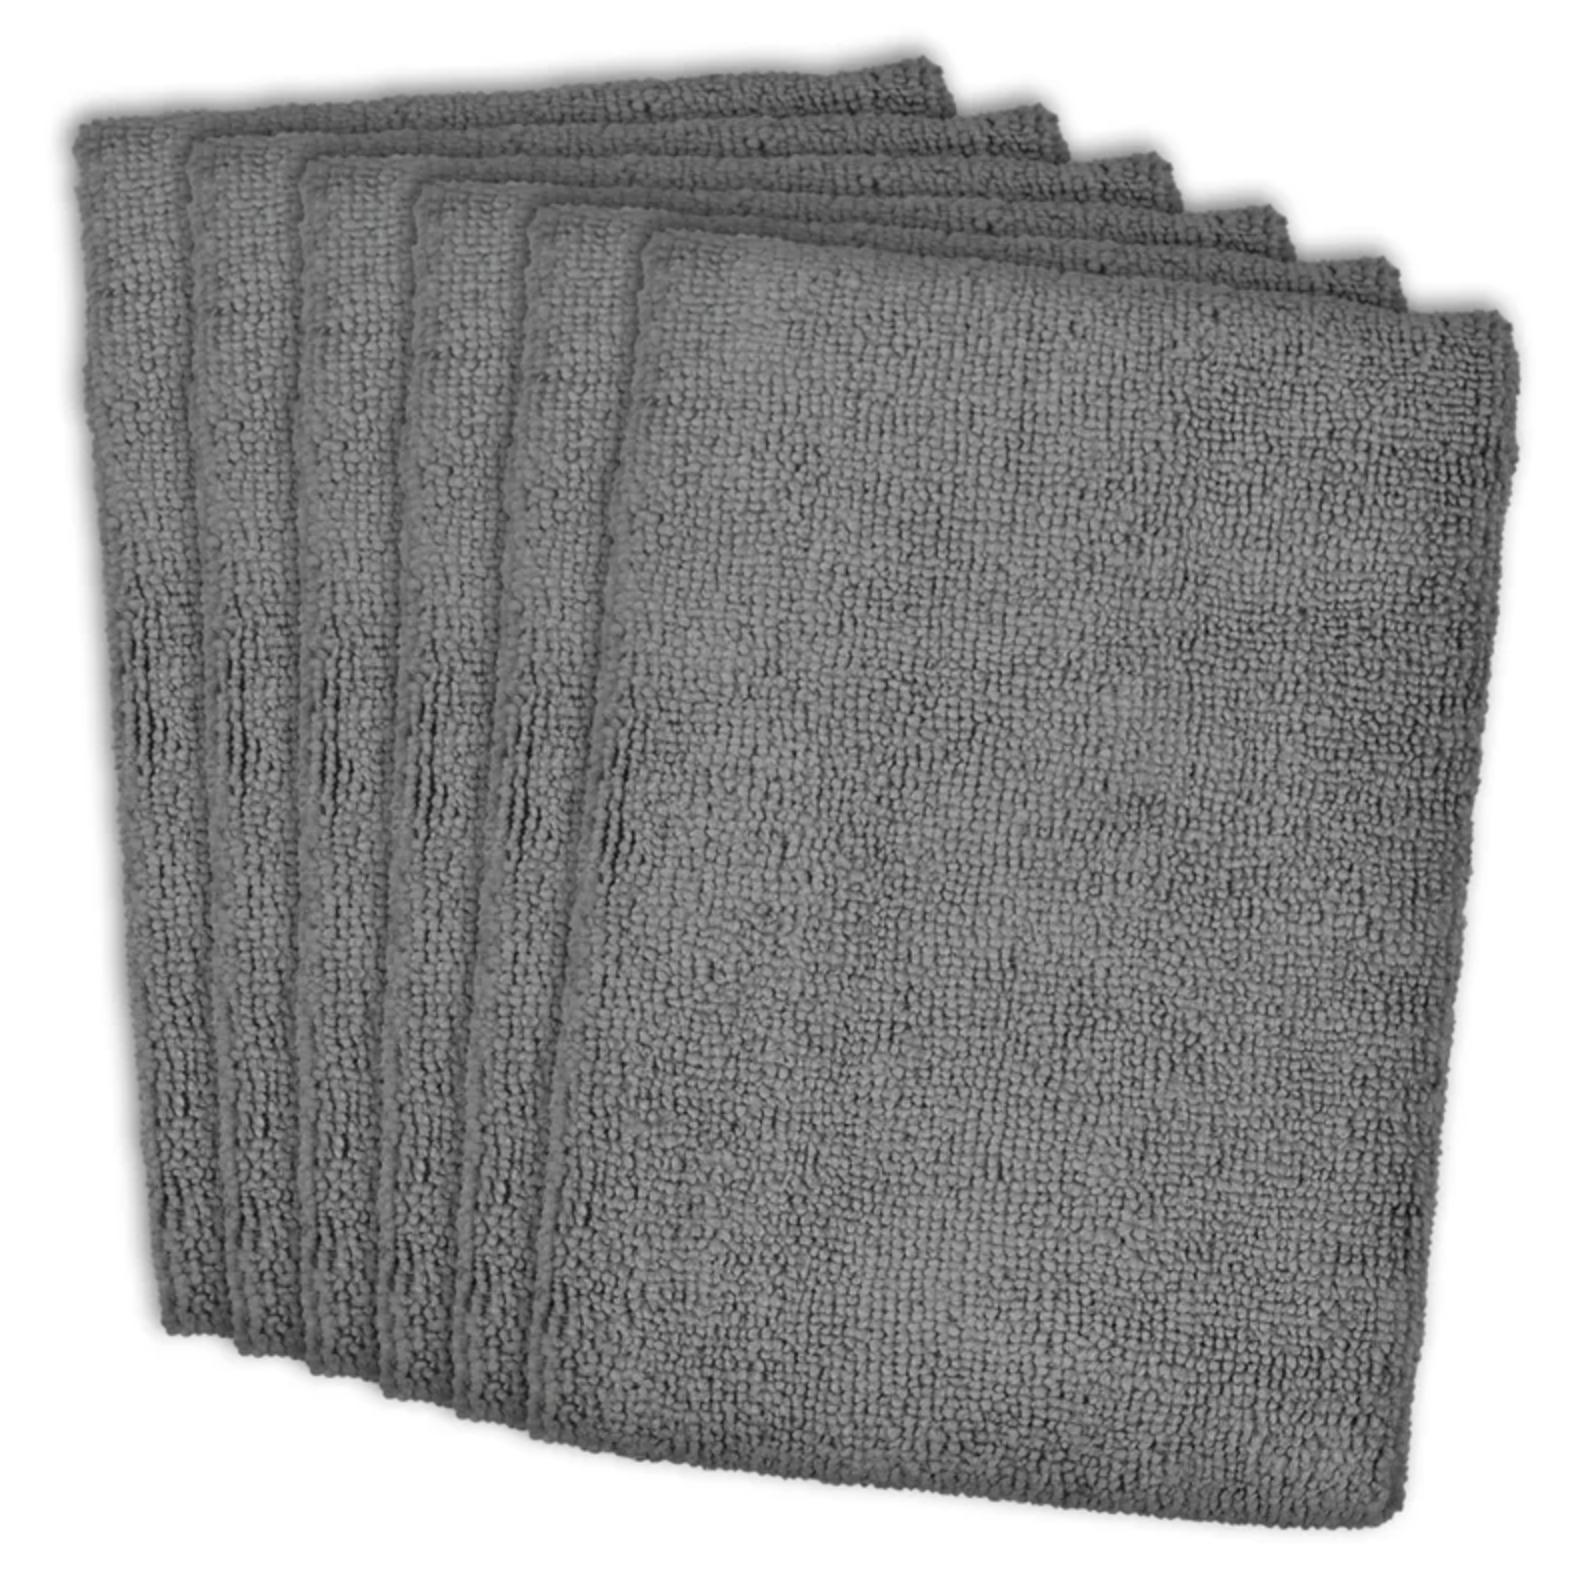 Microfiber Dish Towels Wash Cloths | Miranda Schroeder Blog